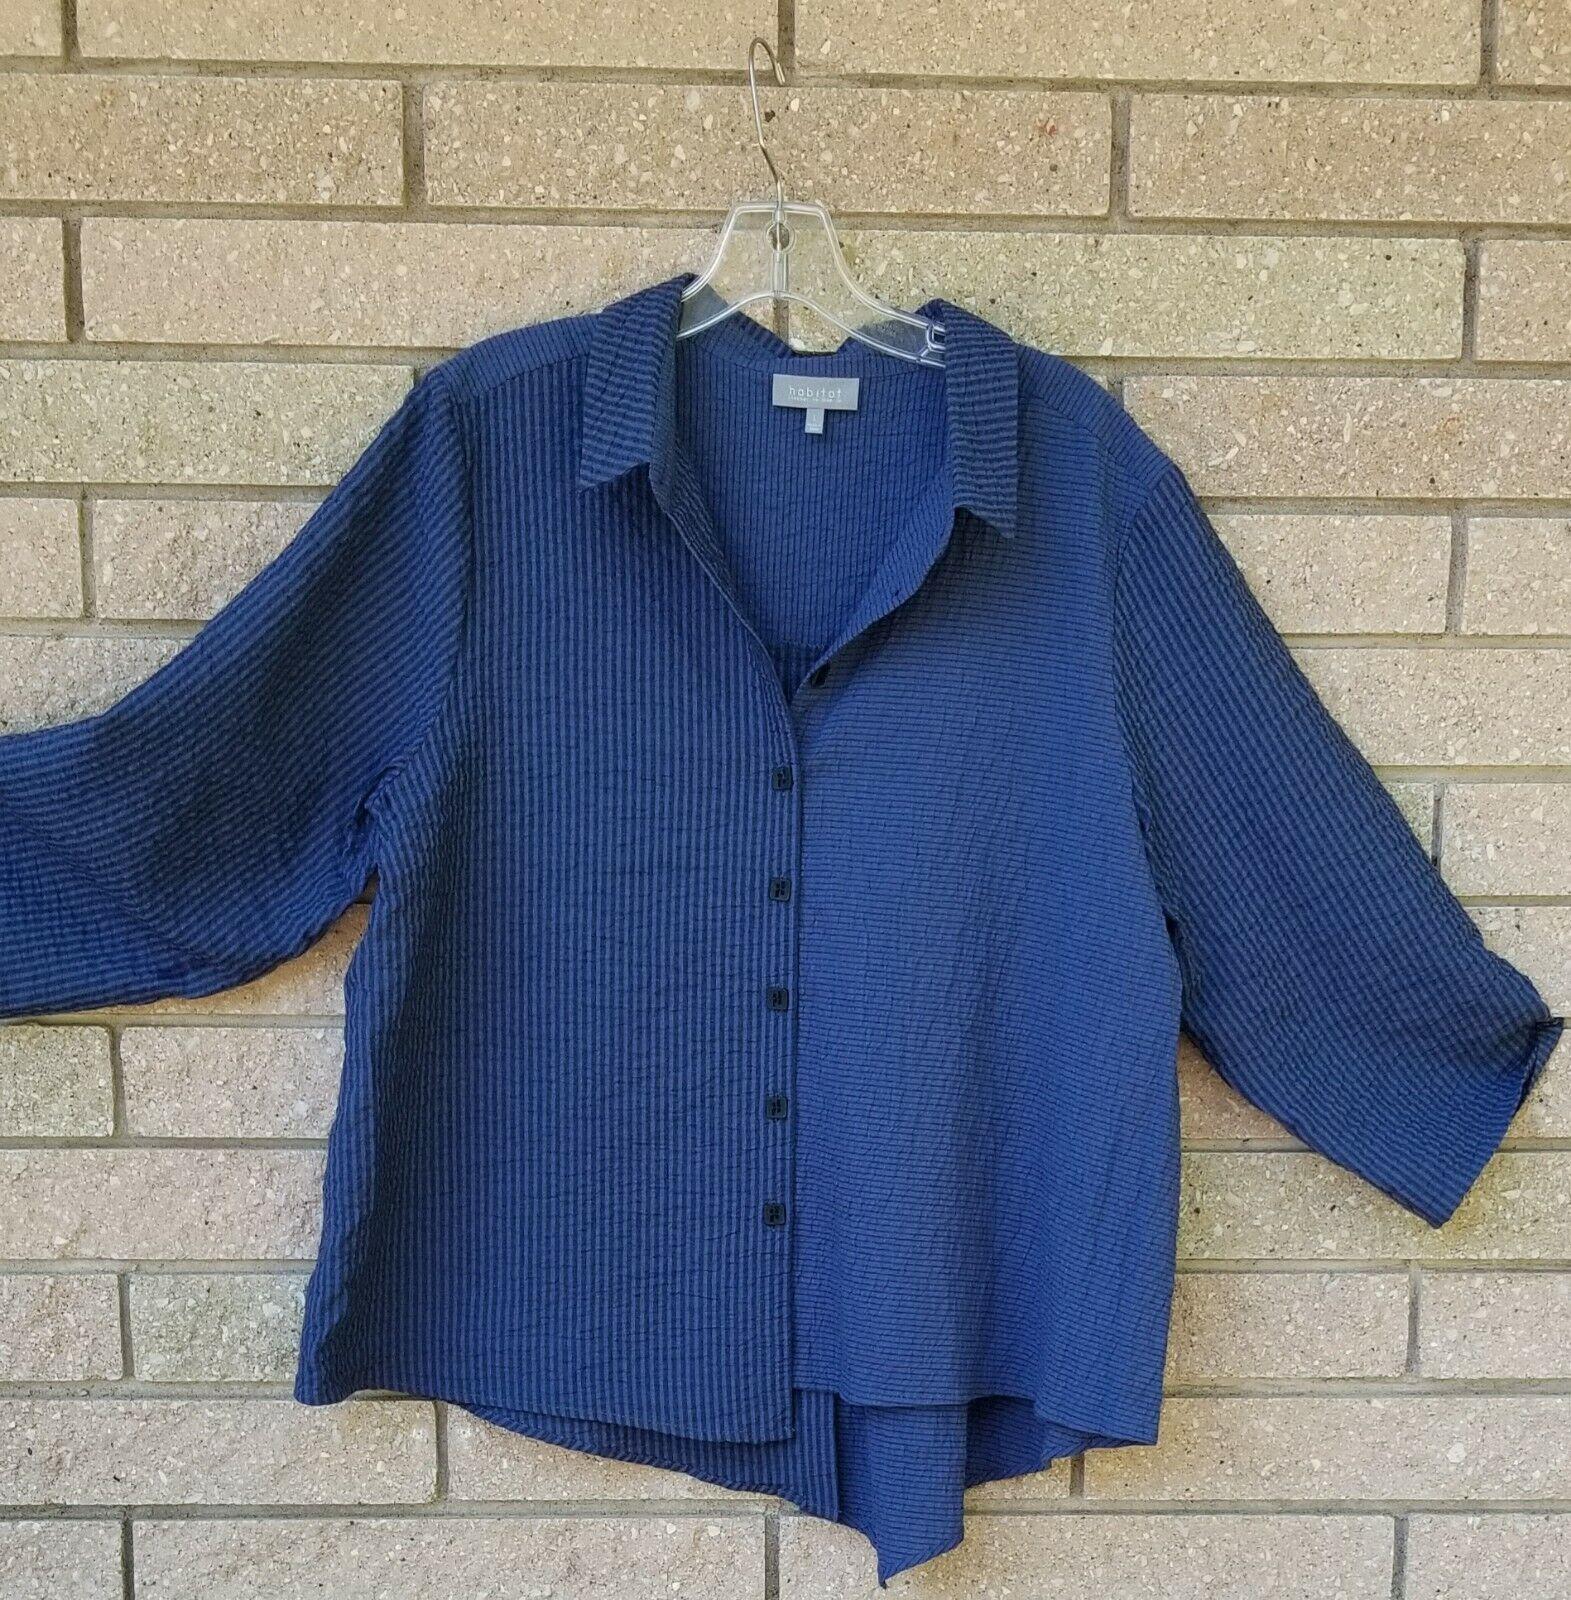 New HABITAT XL 2X Taste down Cotton blouse Blau denim striped